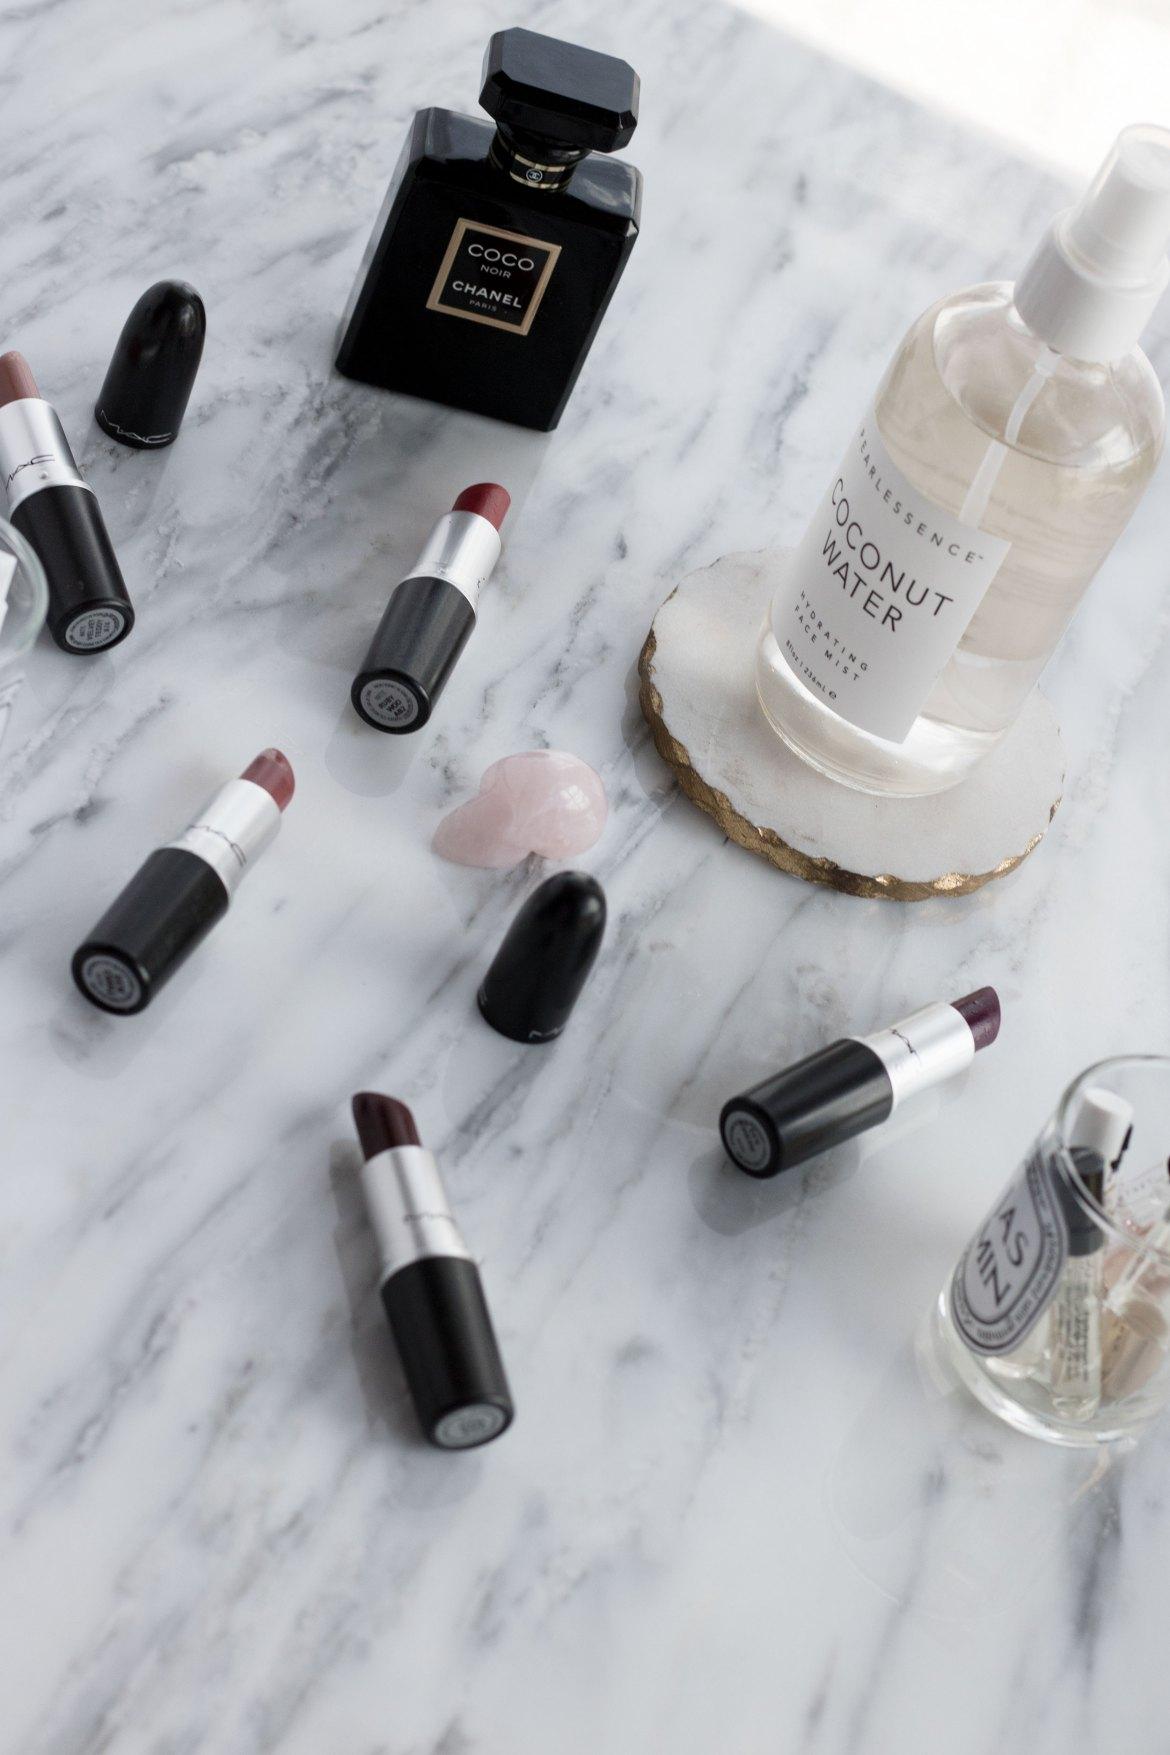 5 super popular MAC lipsticks that are worth the hype